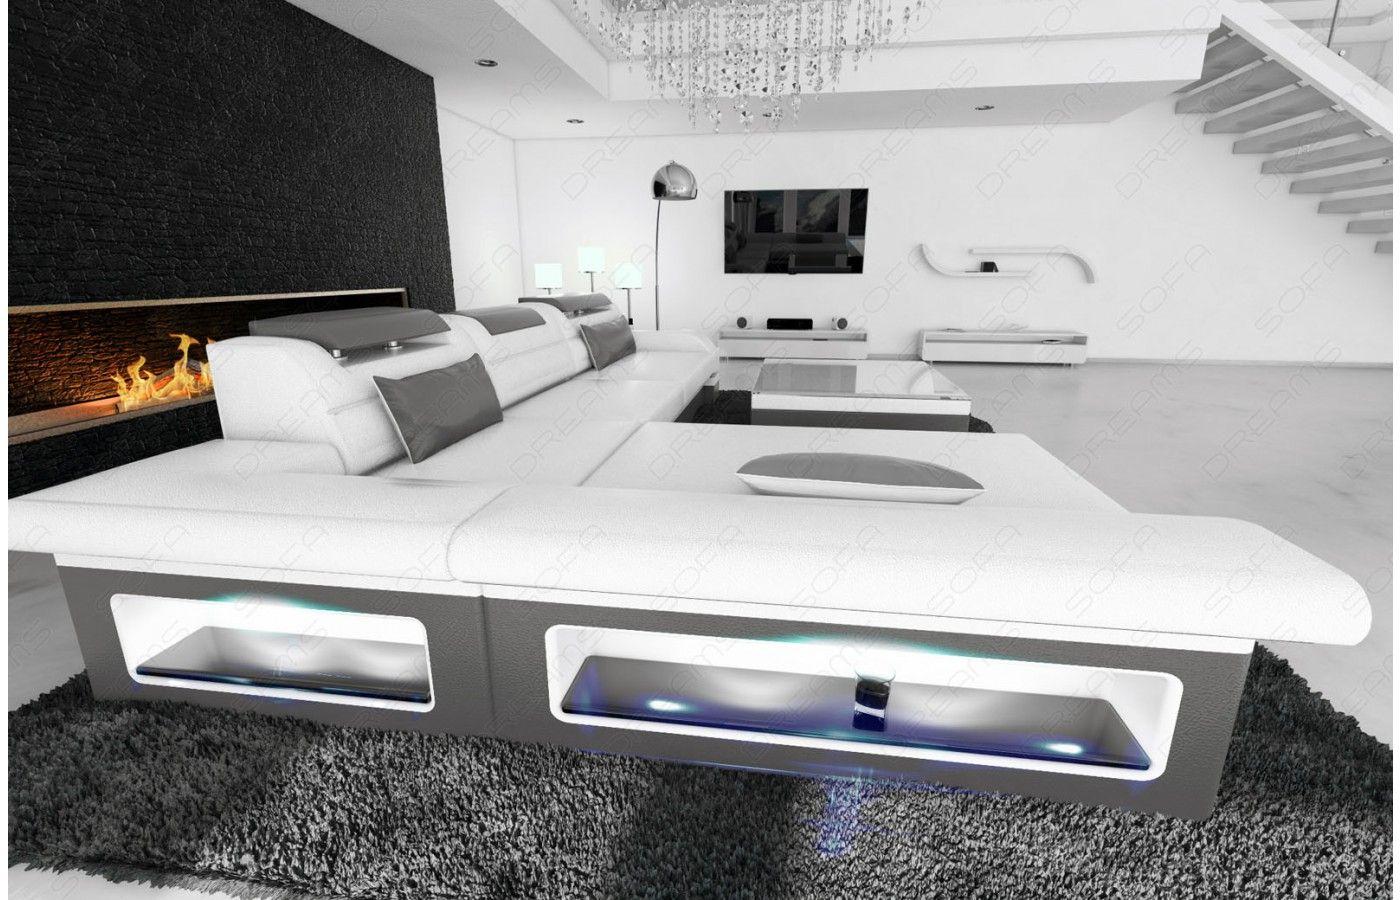 Exklusive Ledersofas designer ledersofa monza l form in weiß grau exklusiv bei sofa